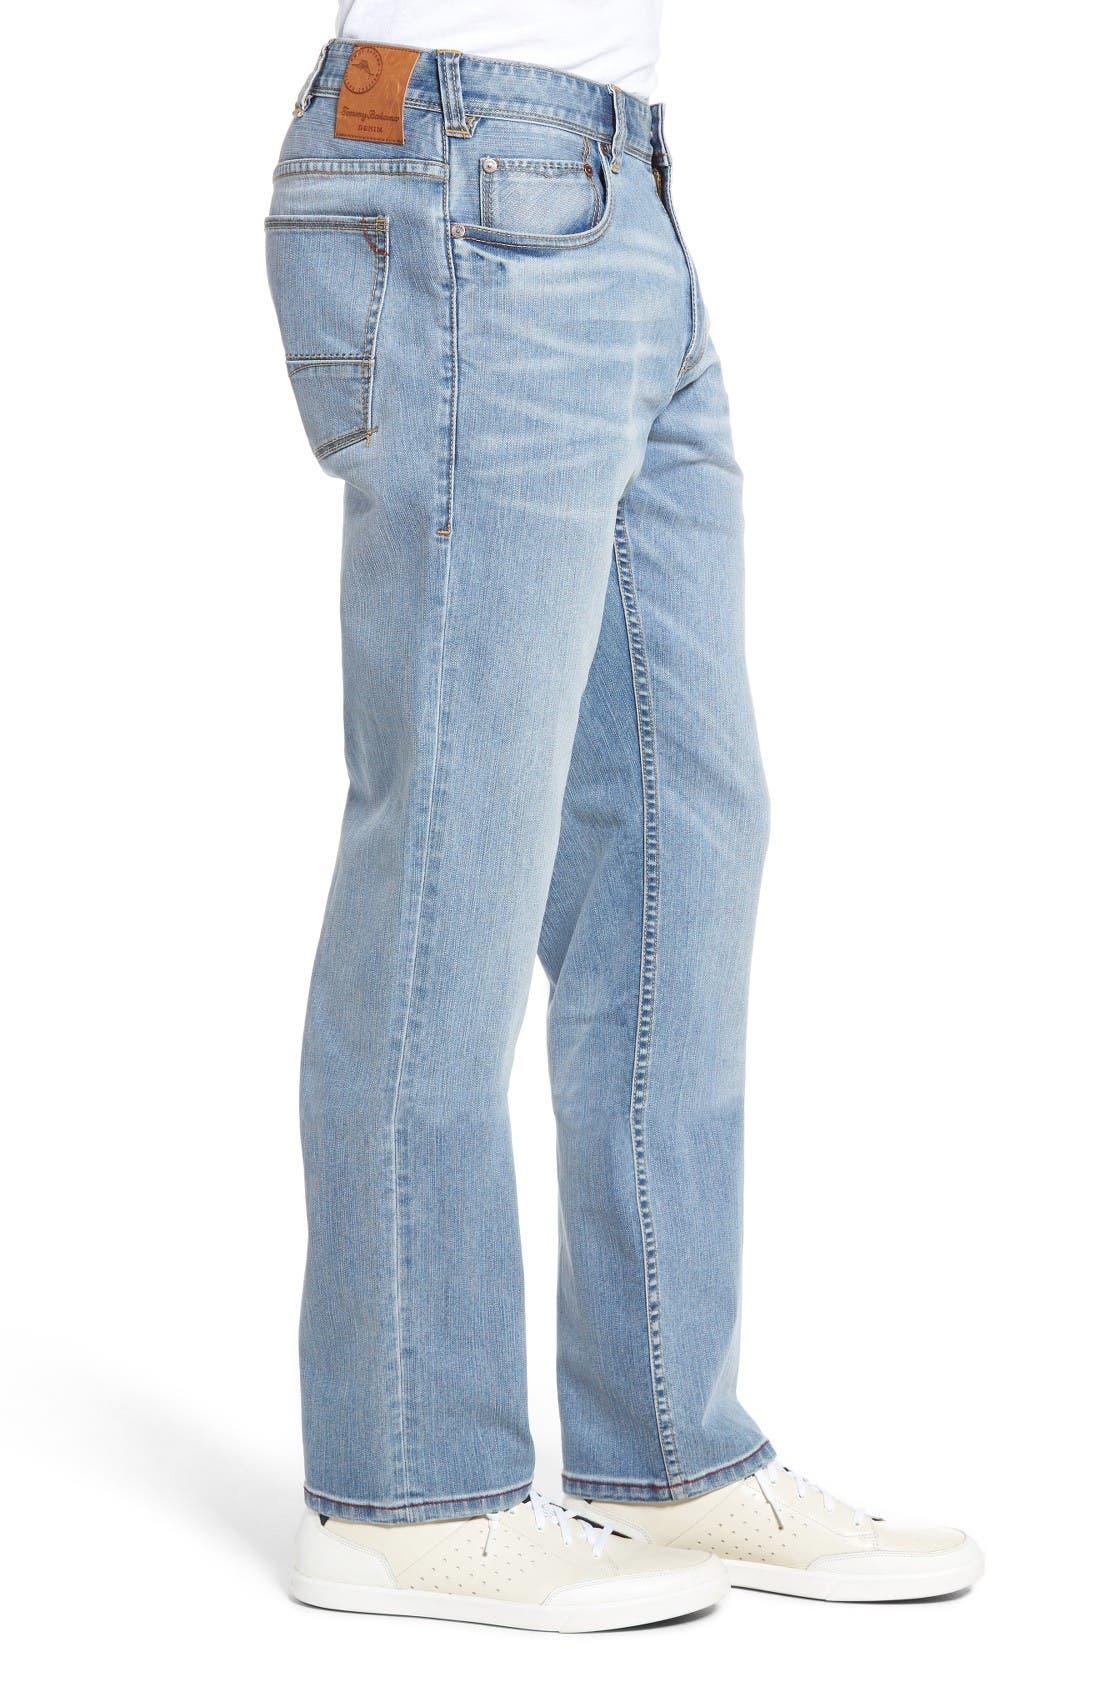 Sorrento Straight Leg Jeans,                             Alternate thumbnail 3, color,                             Light Wash